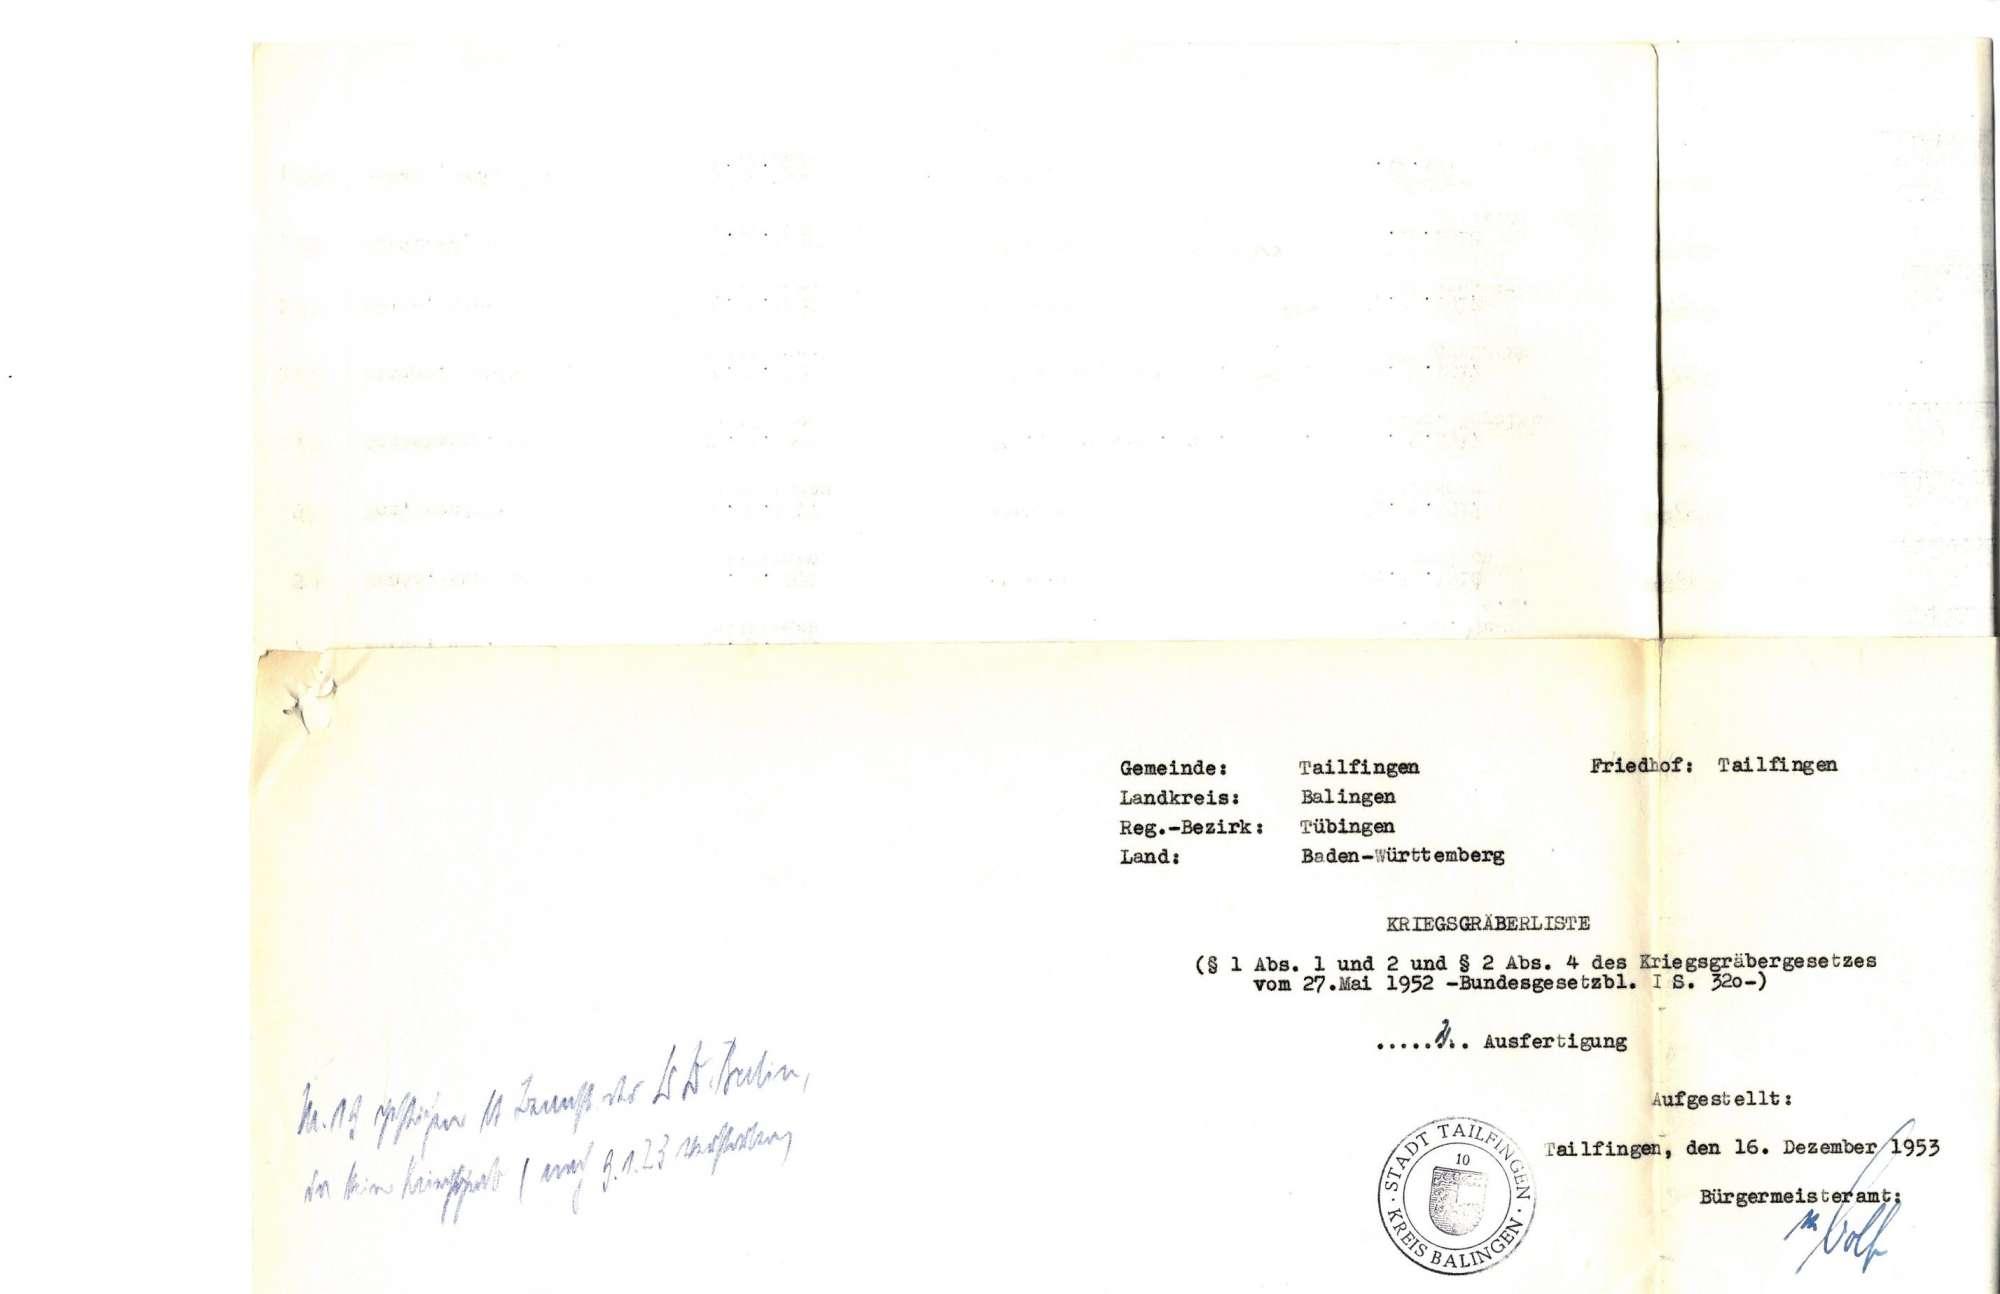 Tailfingen, Bild 2